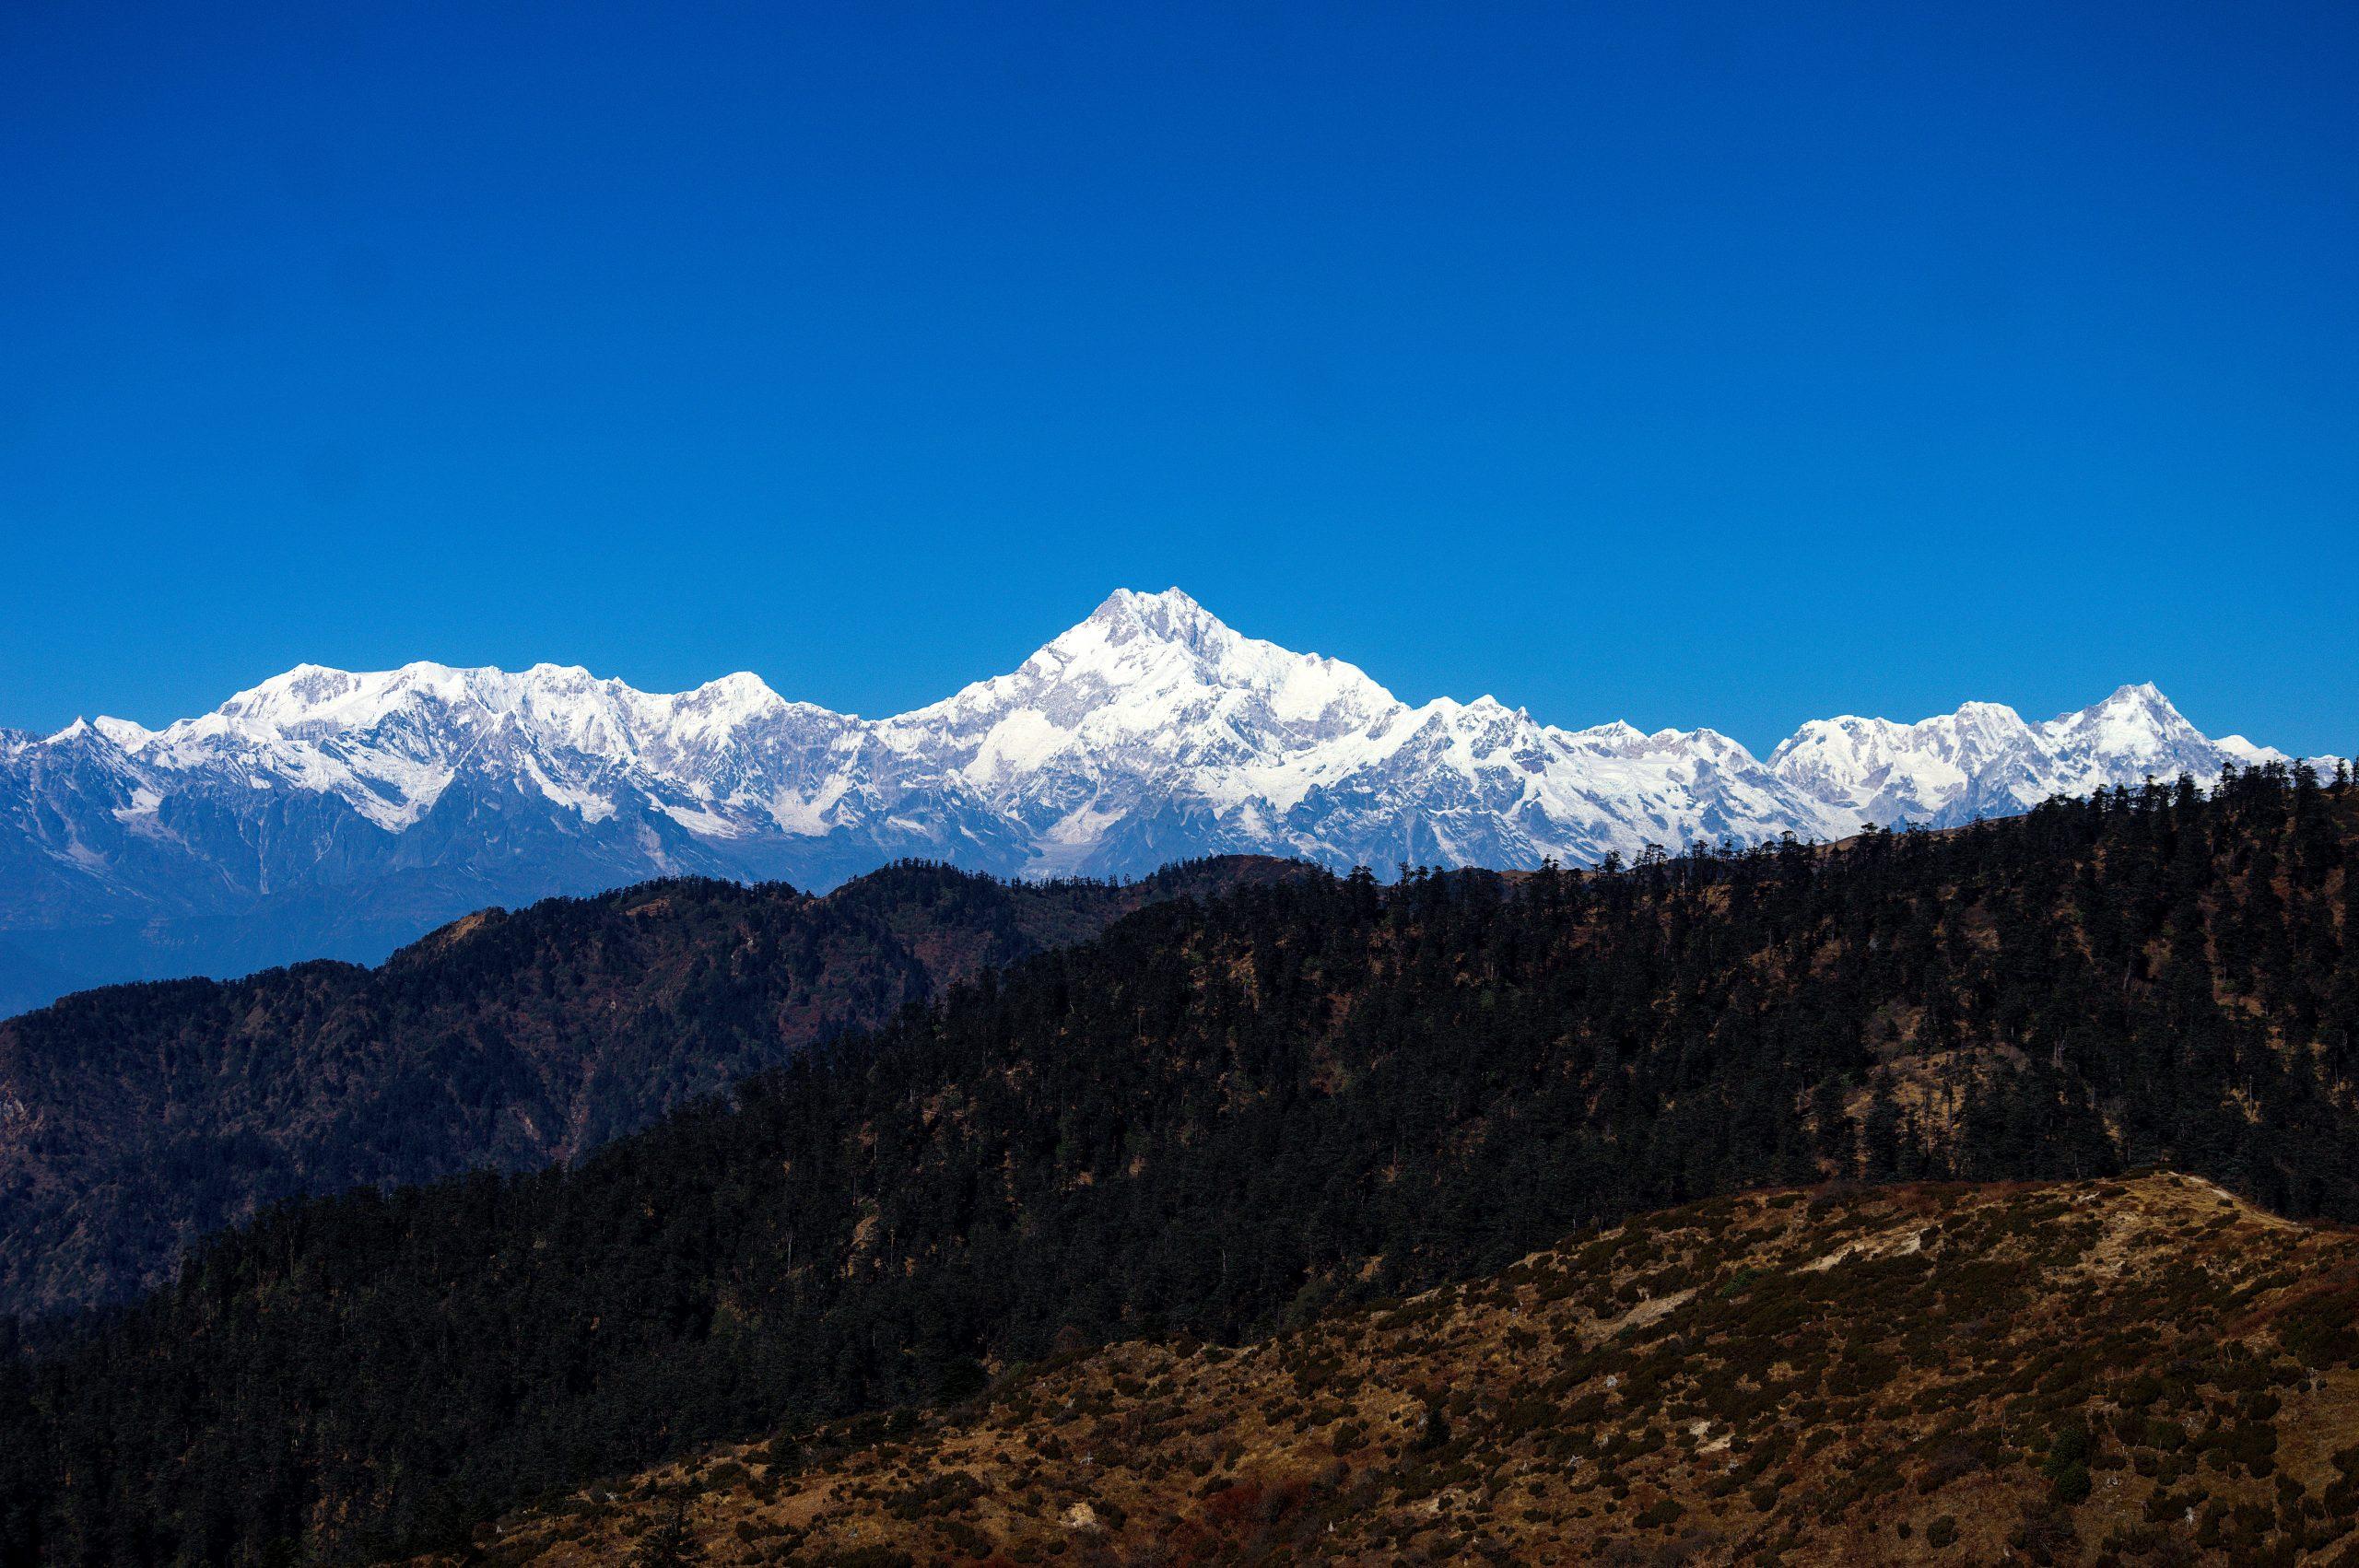 Kanchenjungha Peak